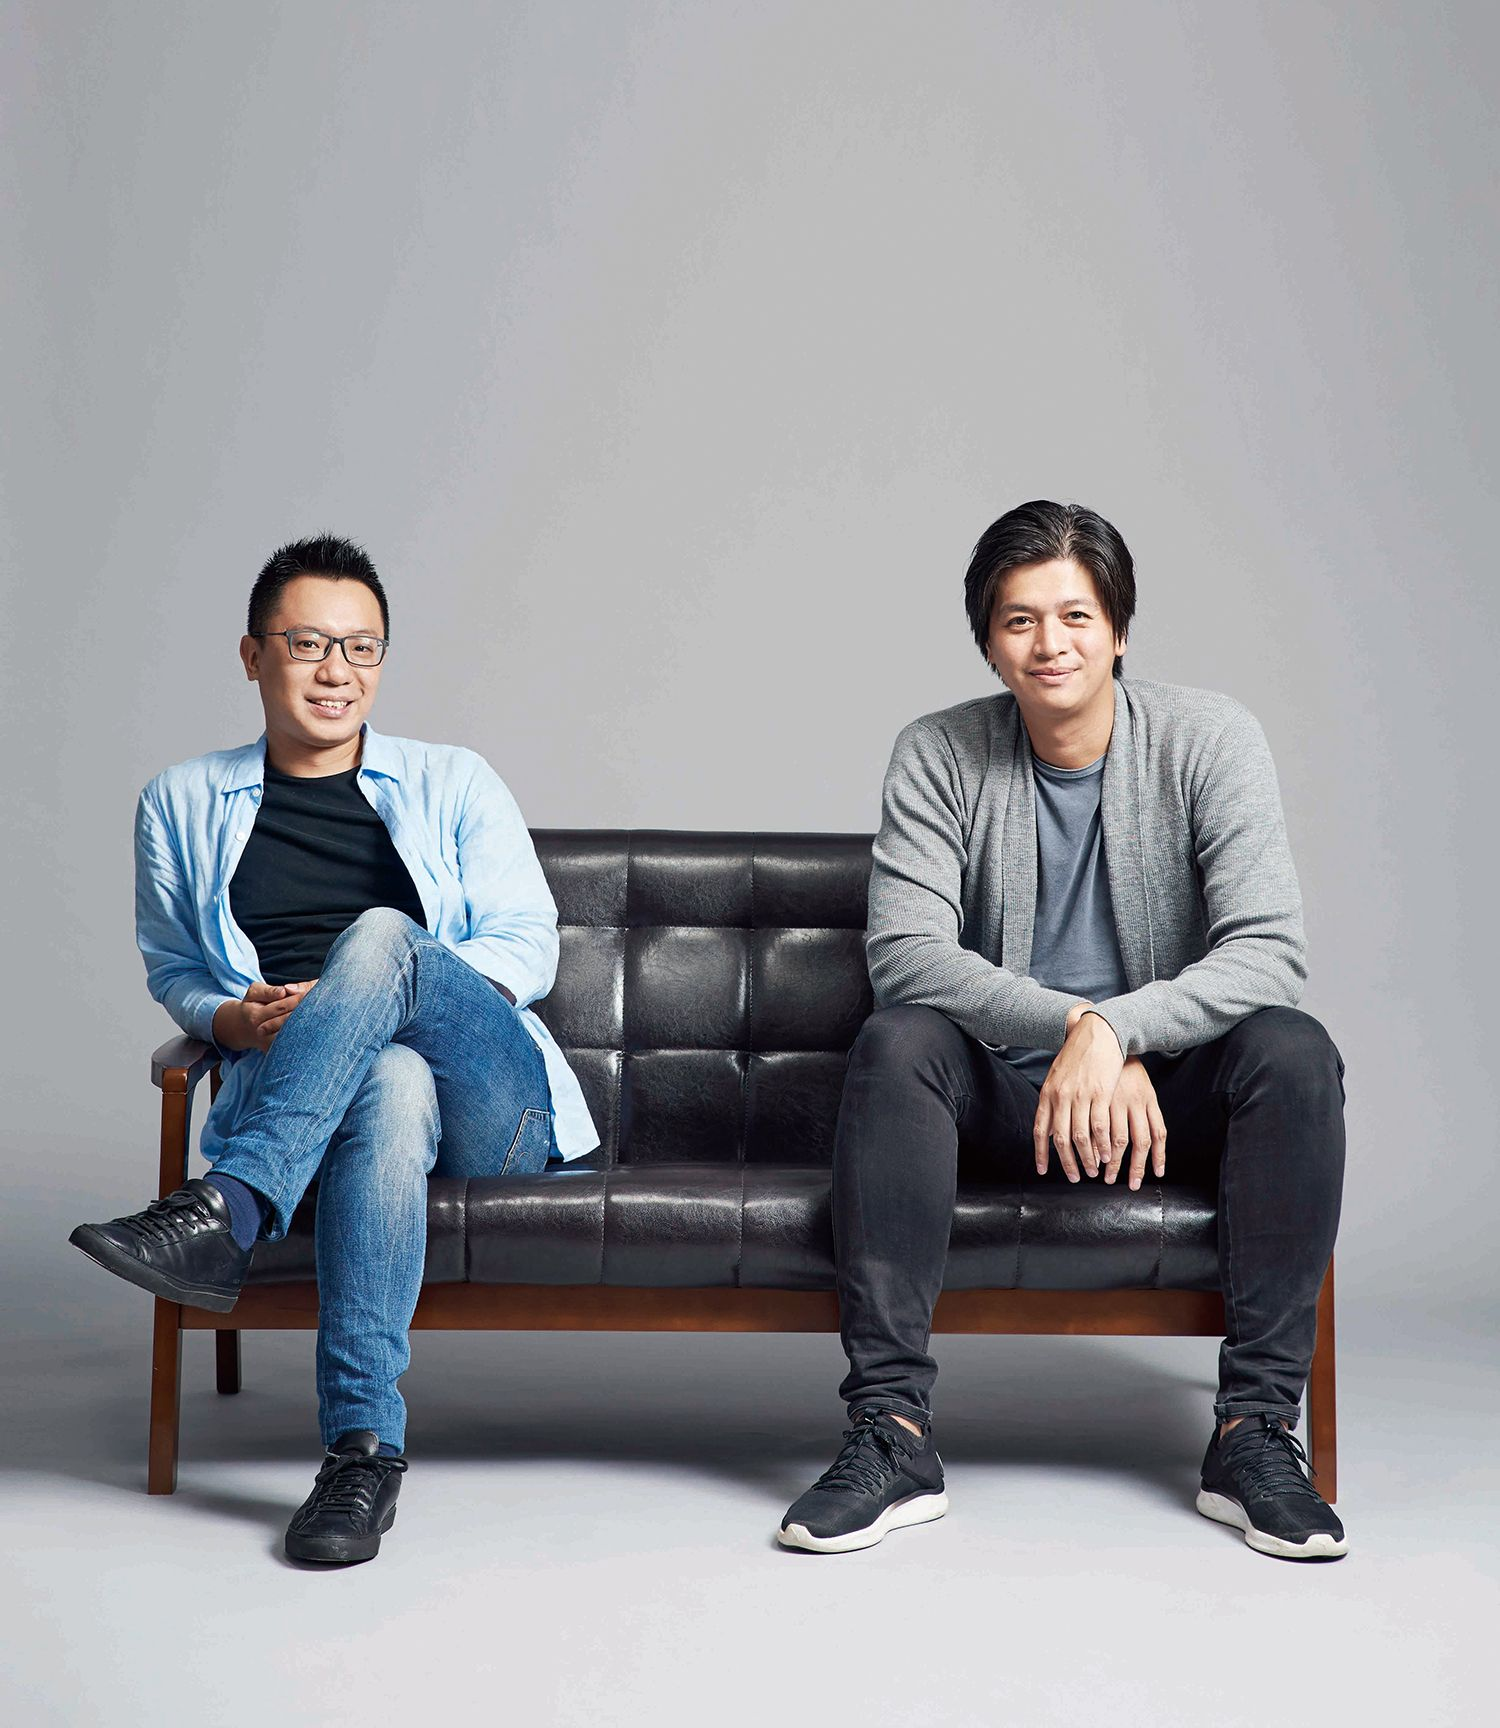 Plan b共同創辦人游適任、茶籽堂創辦人趙文豪。(攝影/SHAO JOU HUANG)